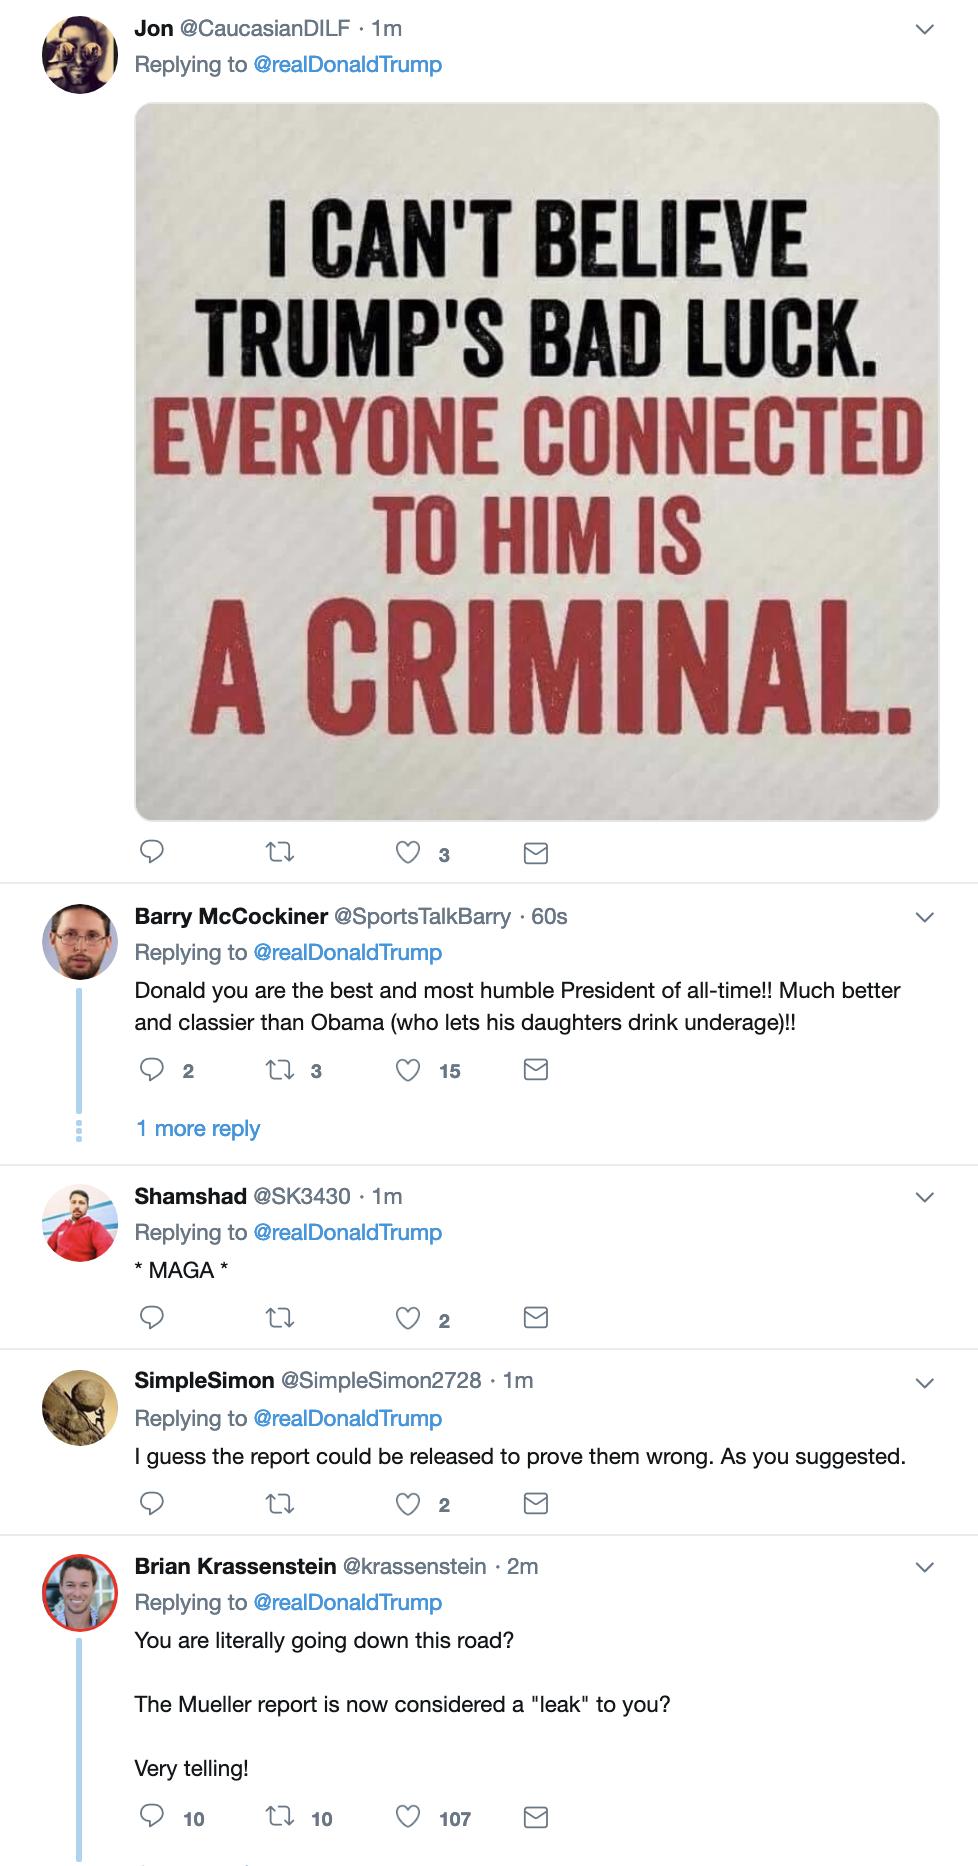 Screen-Shot-2019-04-07-at-8.54.23-AM Trump Finishes Sunday TV & Live Tweets Rage Filled Emotional Collapse Corruption Crime Donald Trump Election 2016 Investigation Media Mueller Politics Robert Mueller Russia Top Stories